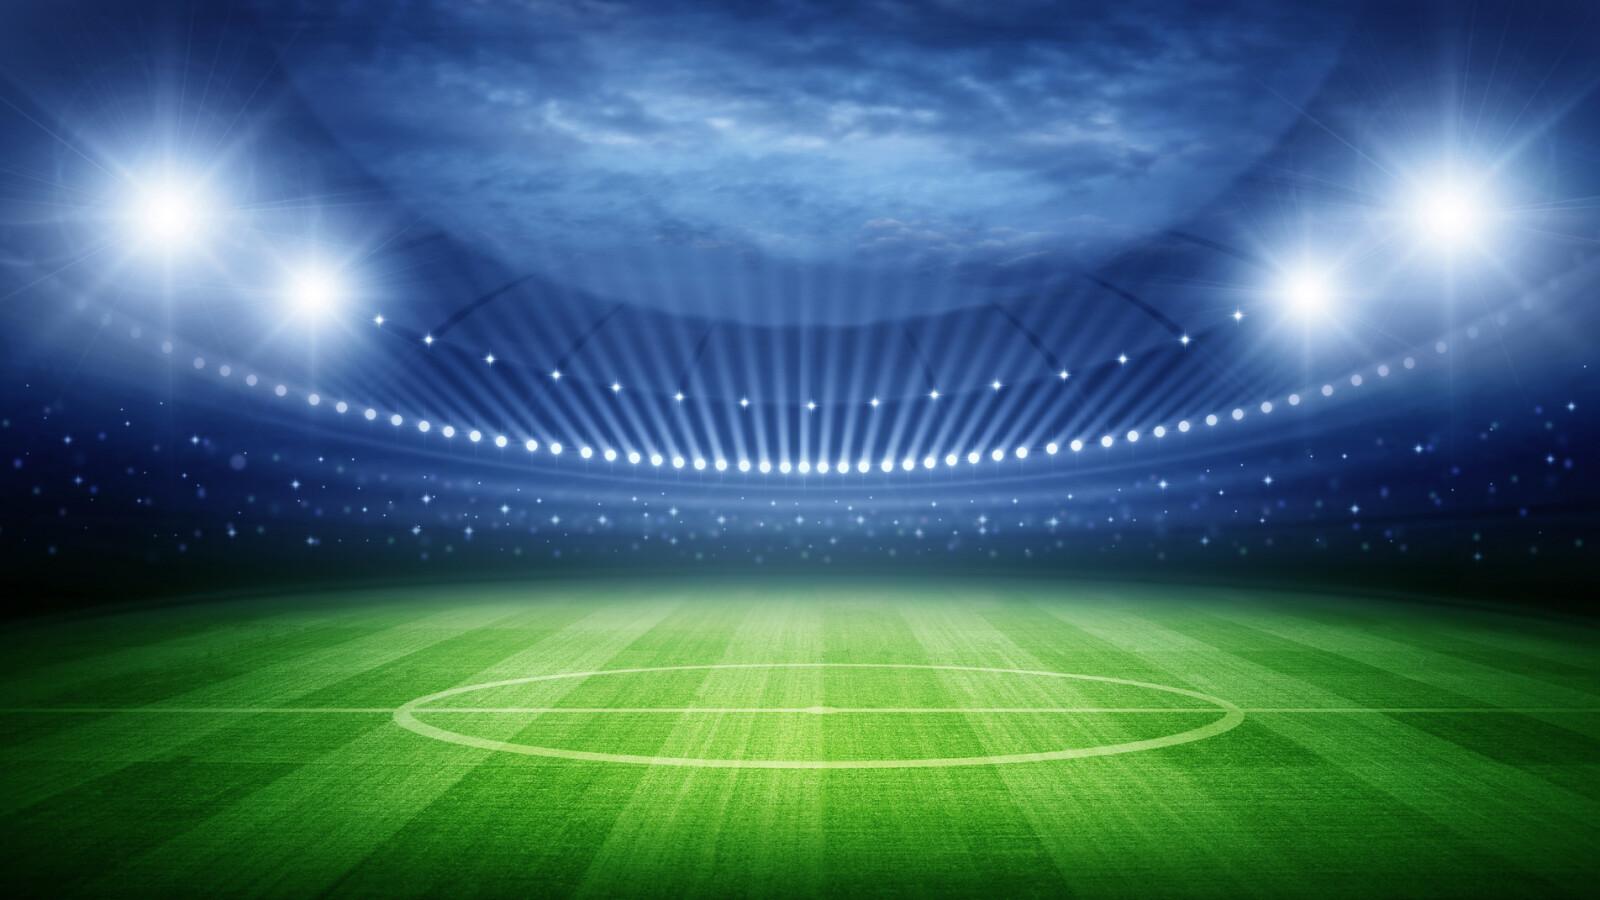 Champions League Im Internet Anschauen